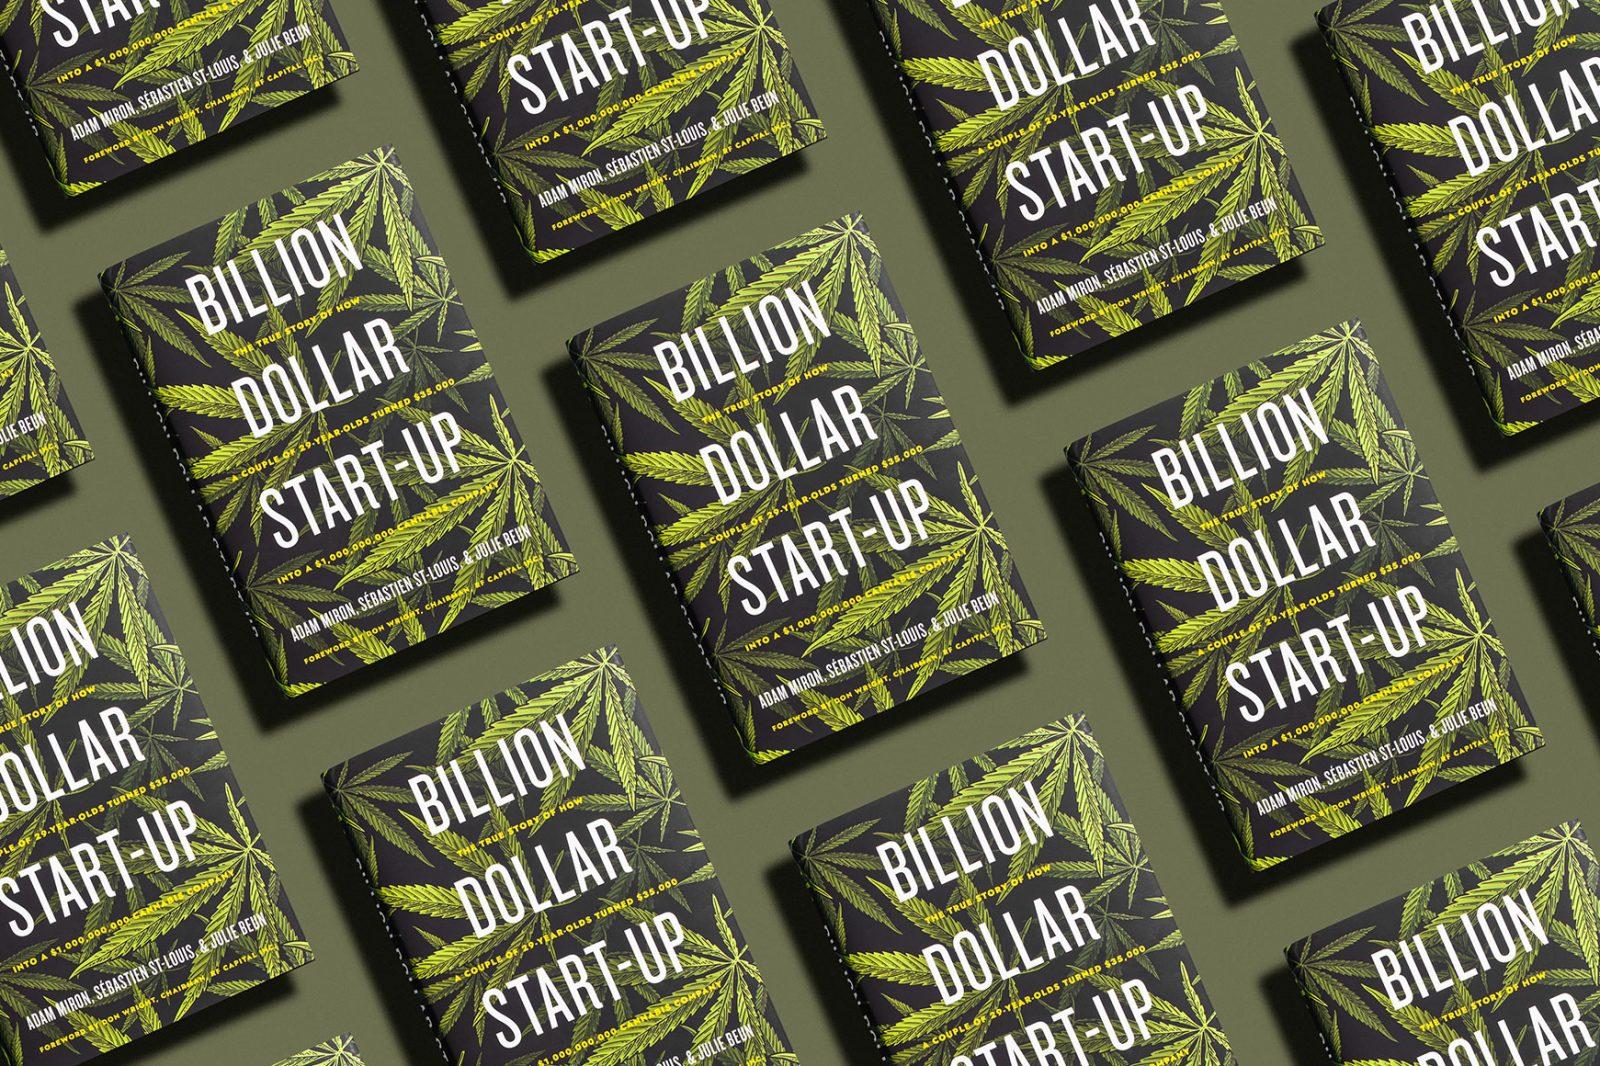 Adam Miron Billion Dollar Start-Up